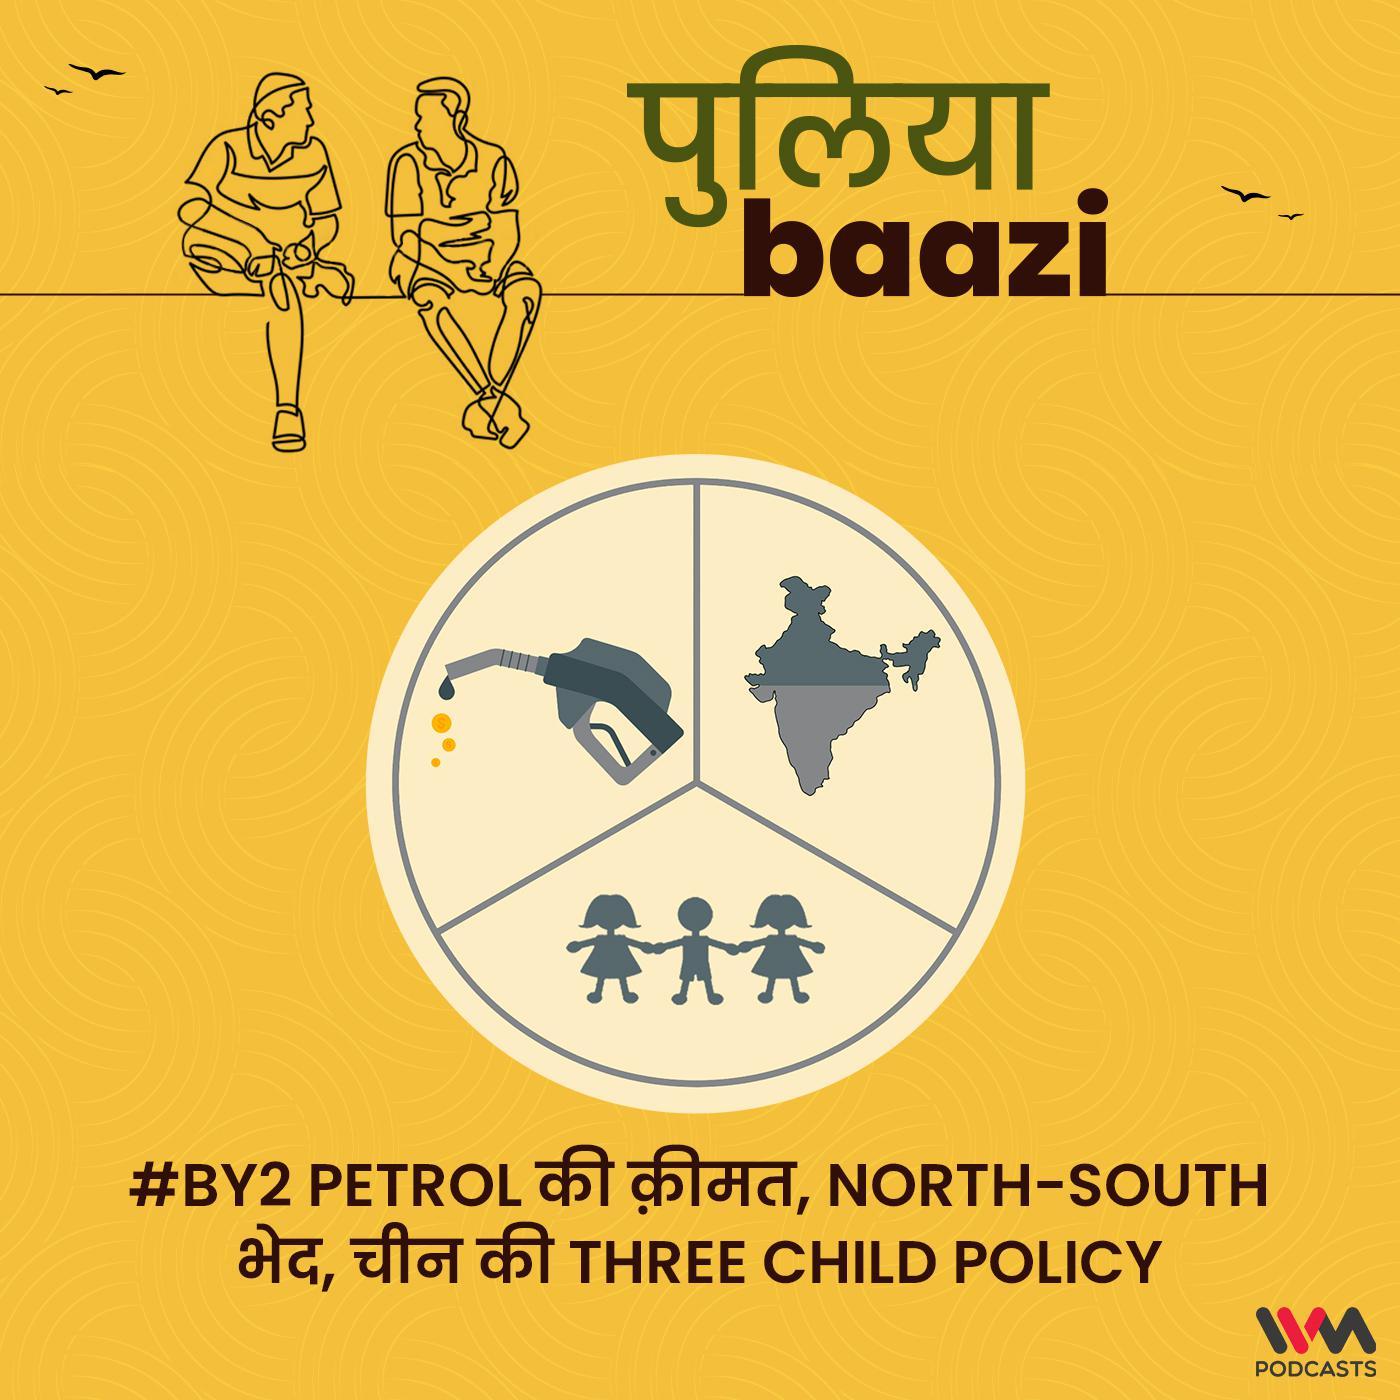 #By2 Petrol की क़ीमत, North-South भेद, चीन की Three Child Policy